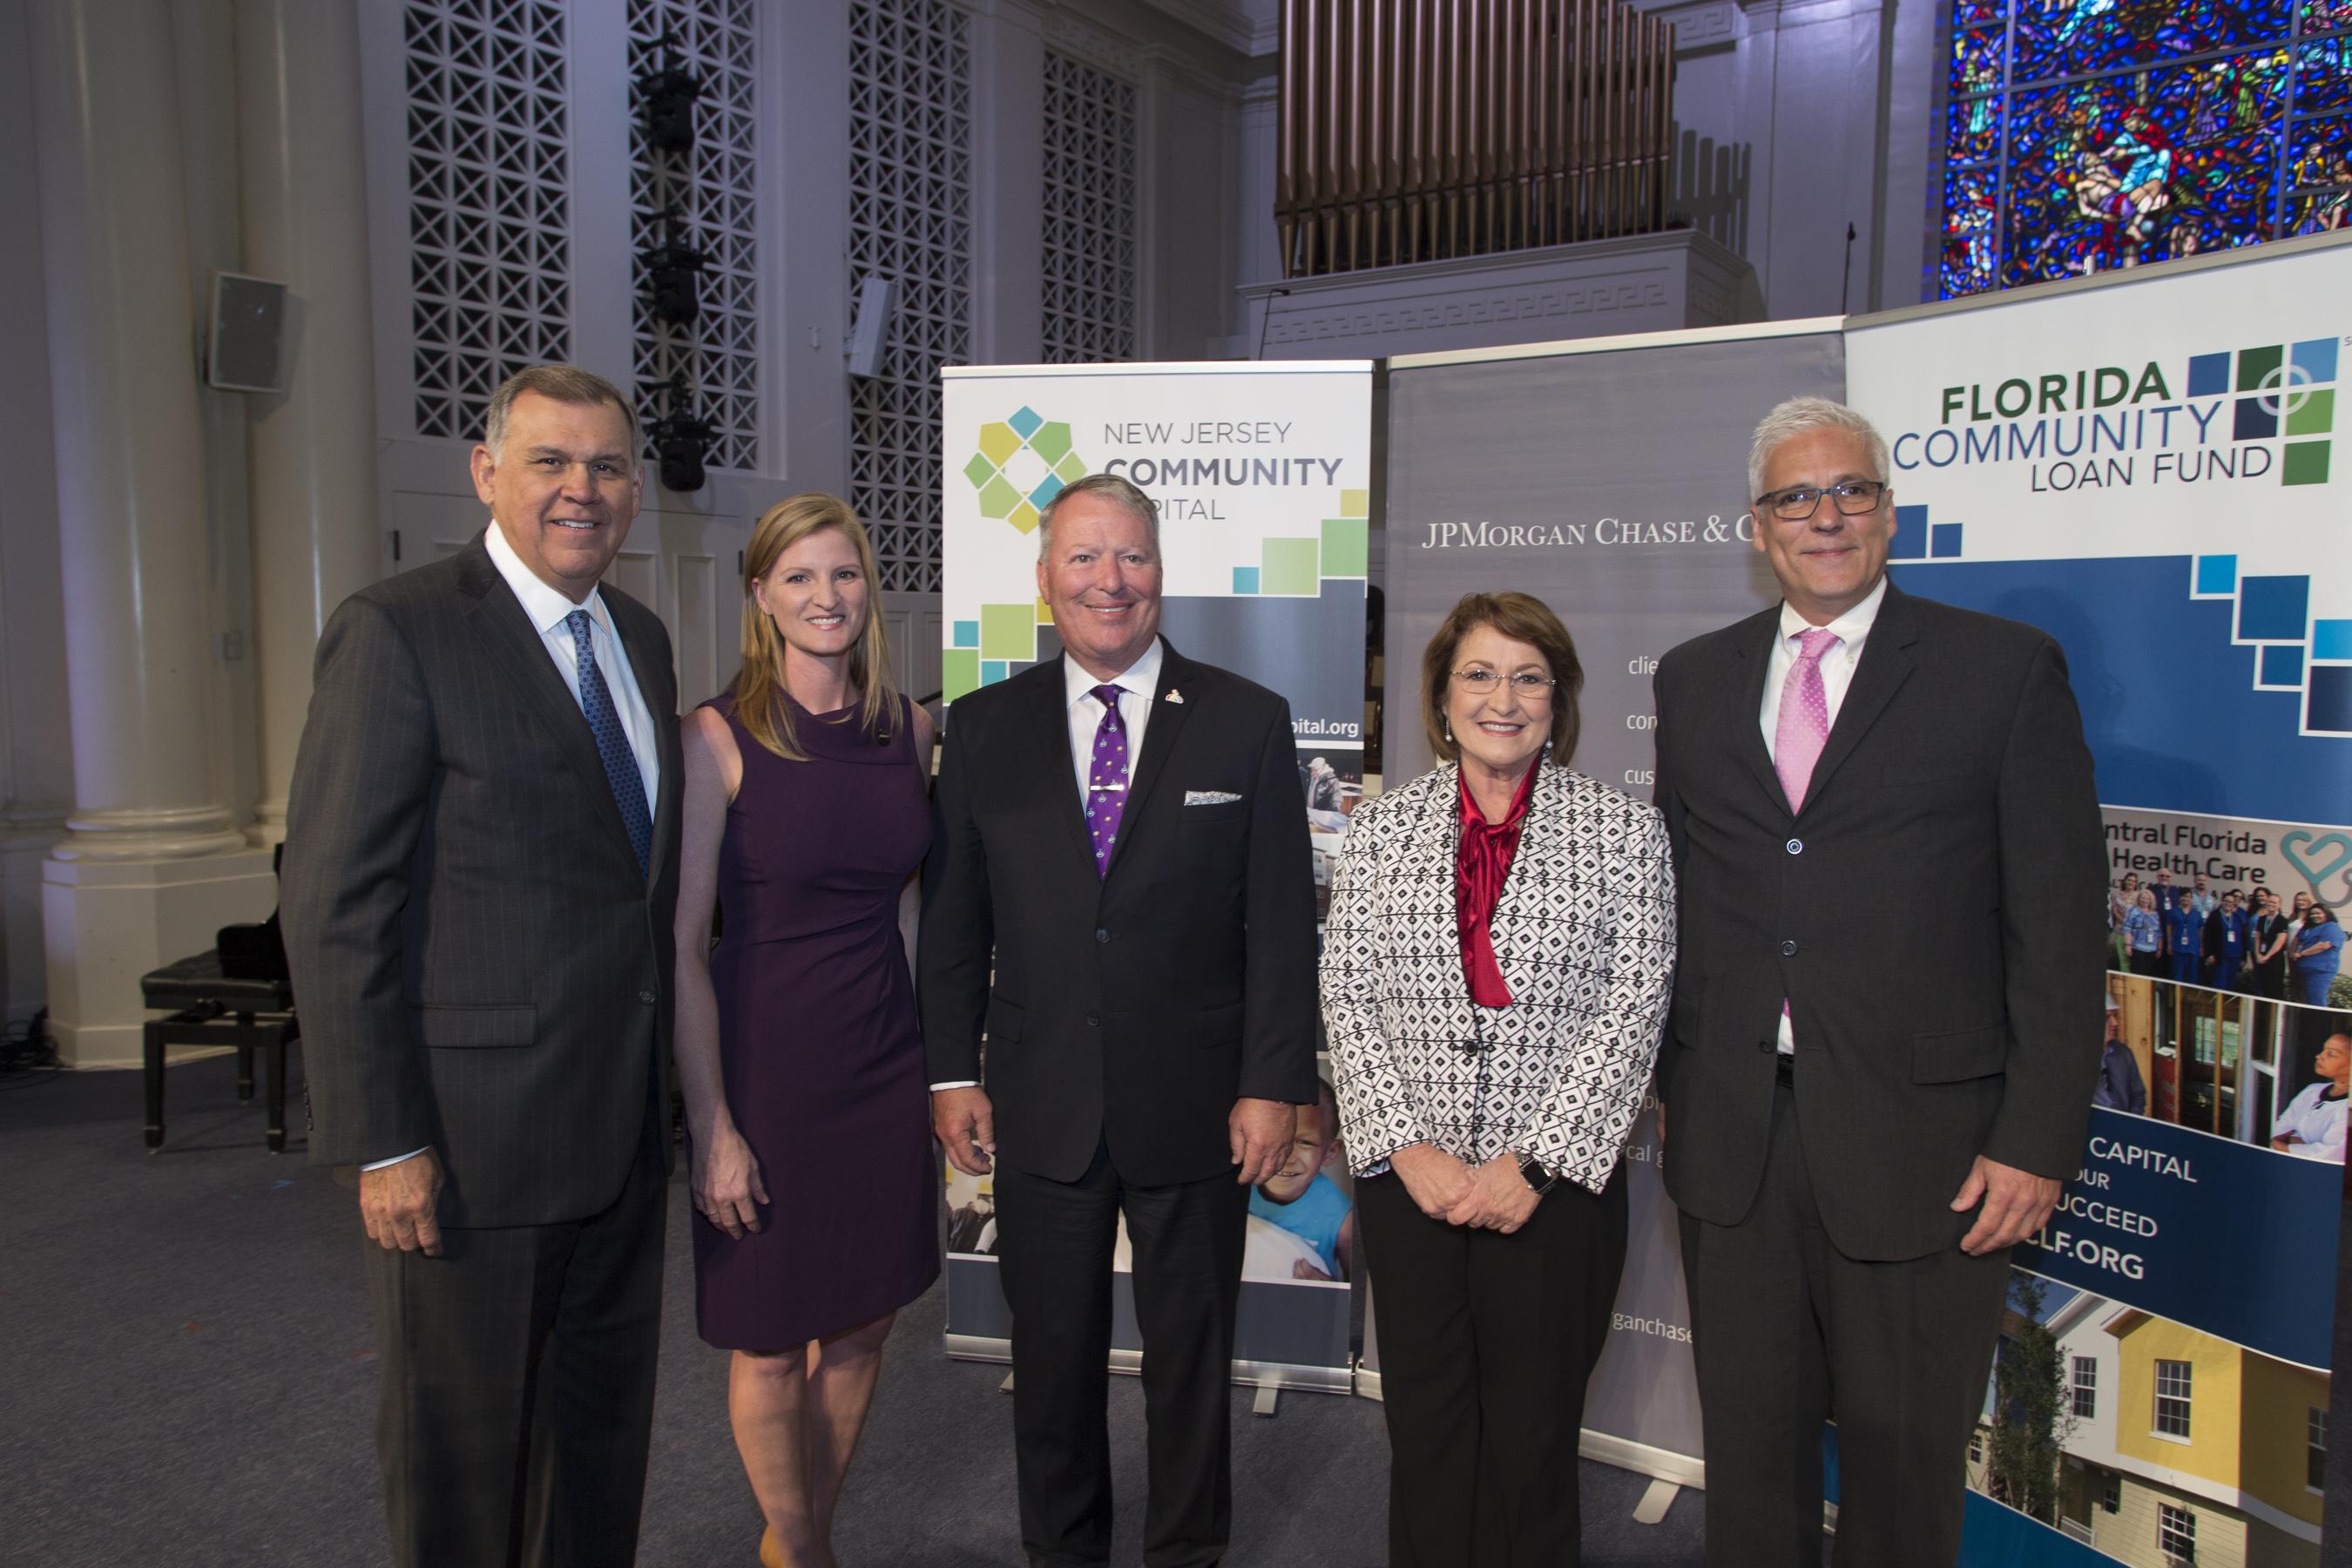 La Alcaldesa Jacobs, el Alcalde Dyer y el personal de JP Morgan